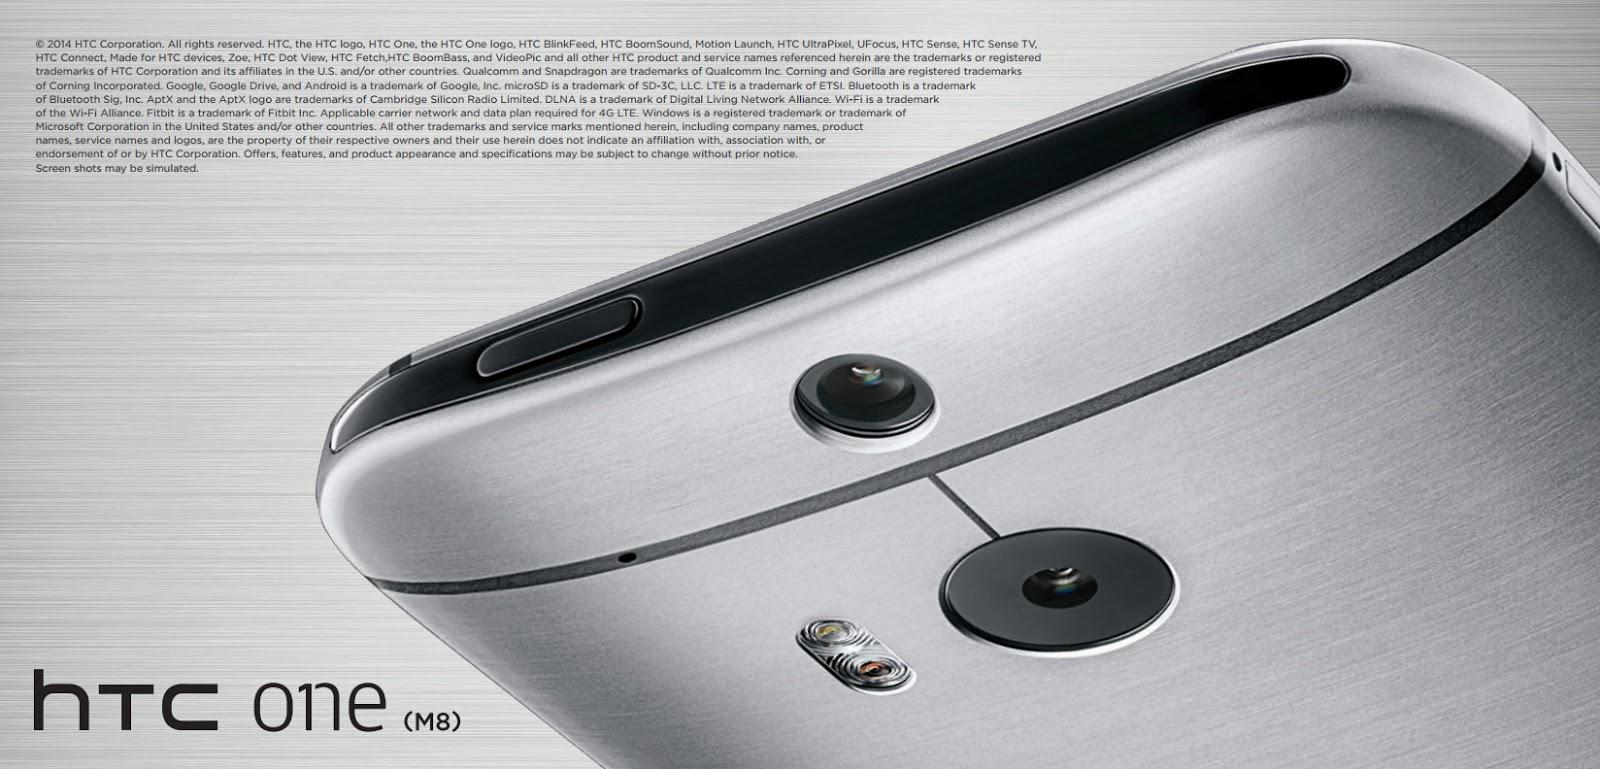 HTC One M8 malaysia